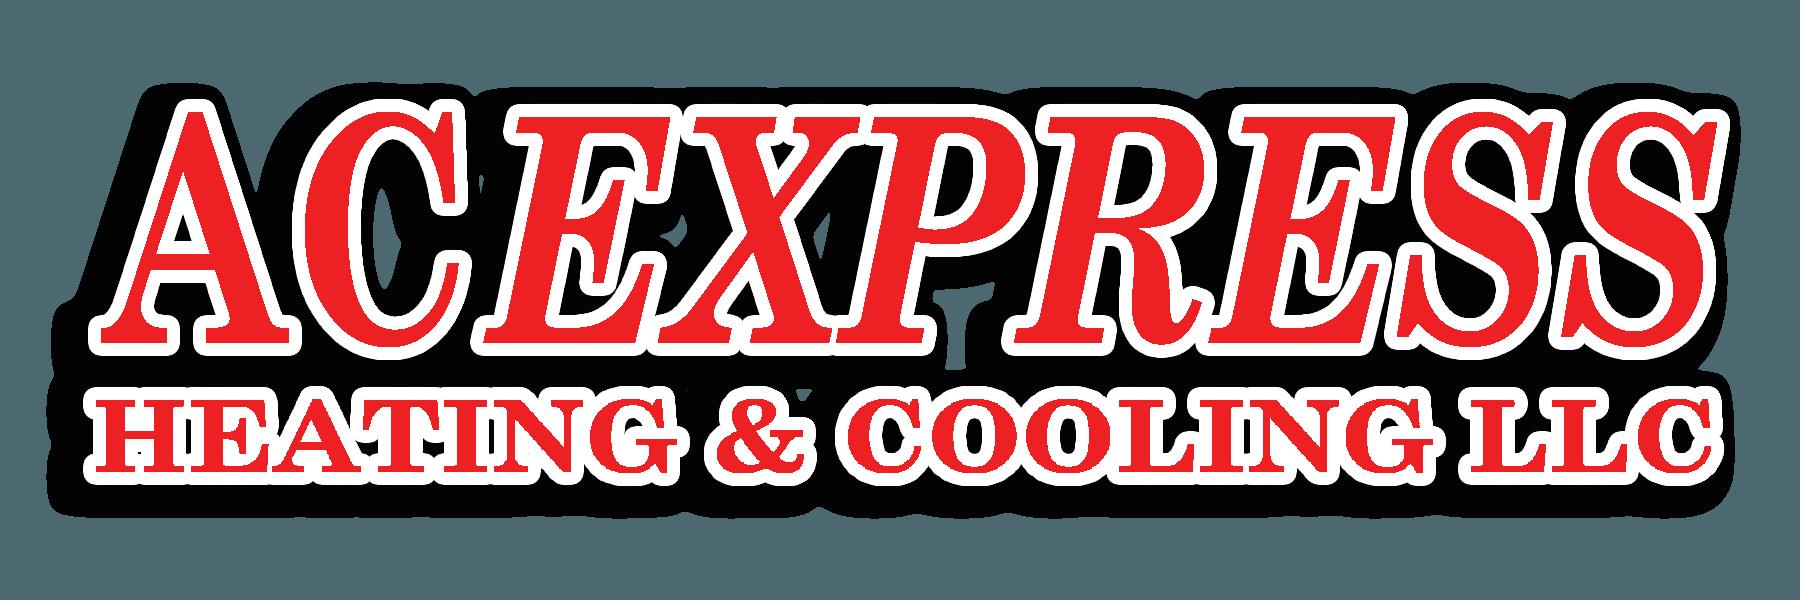 AC Express